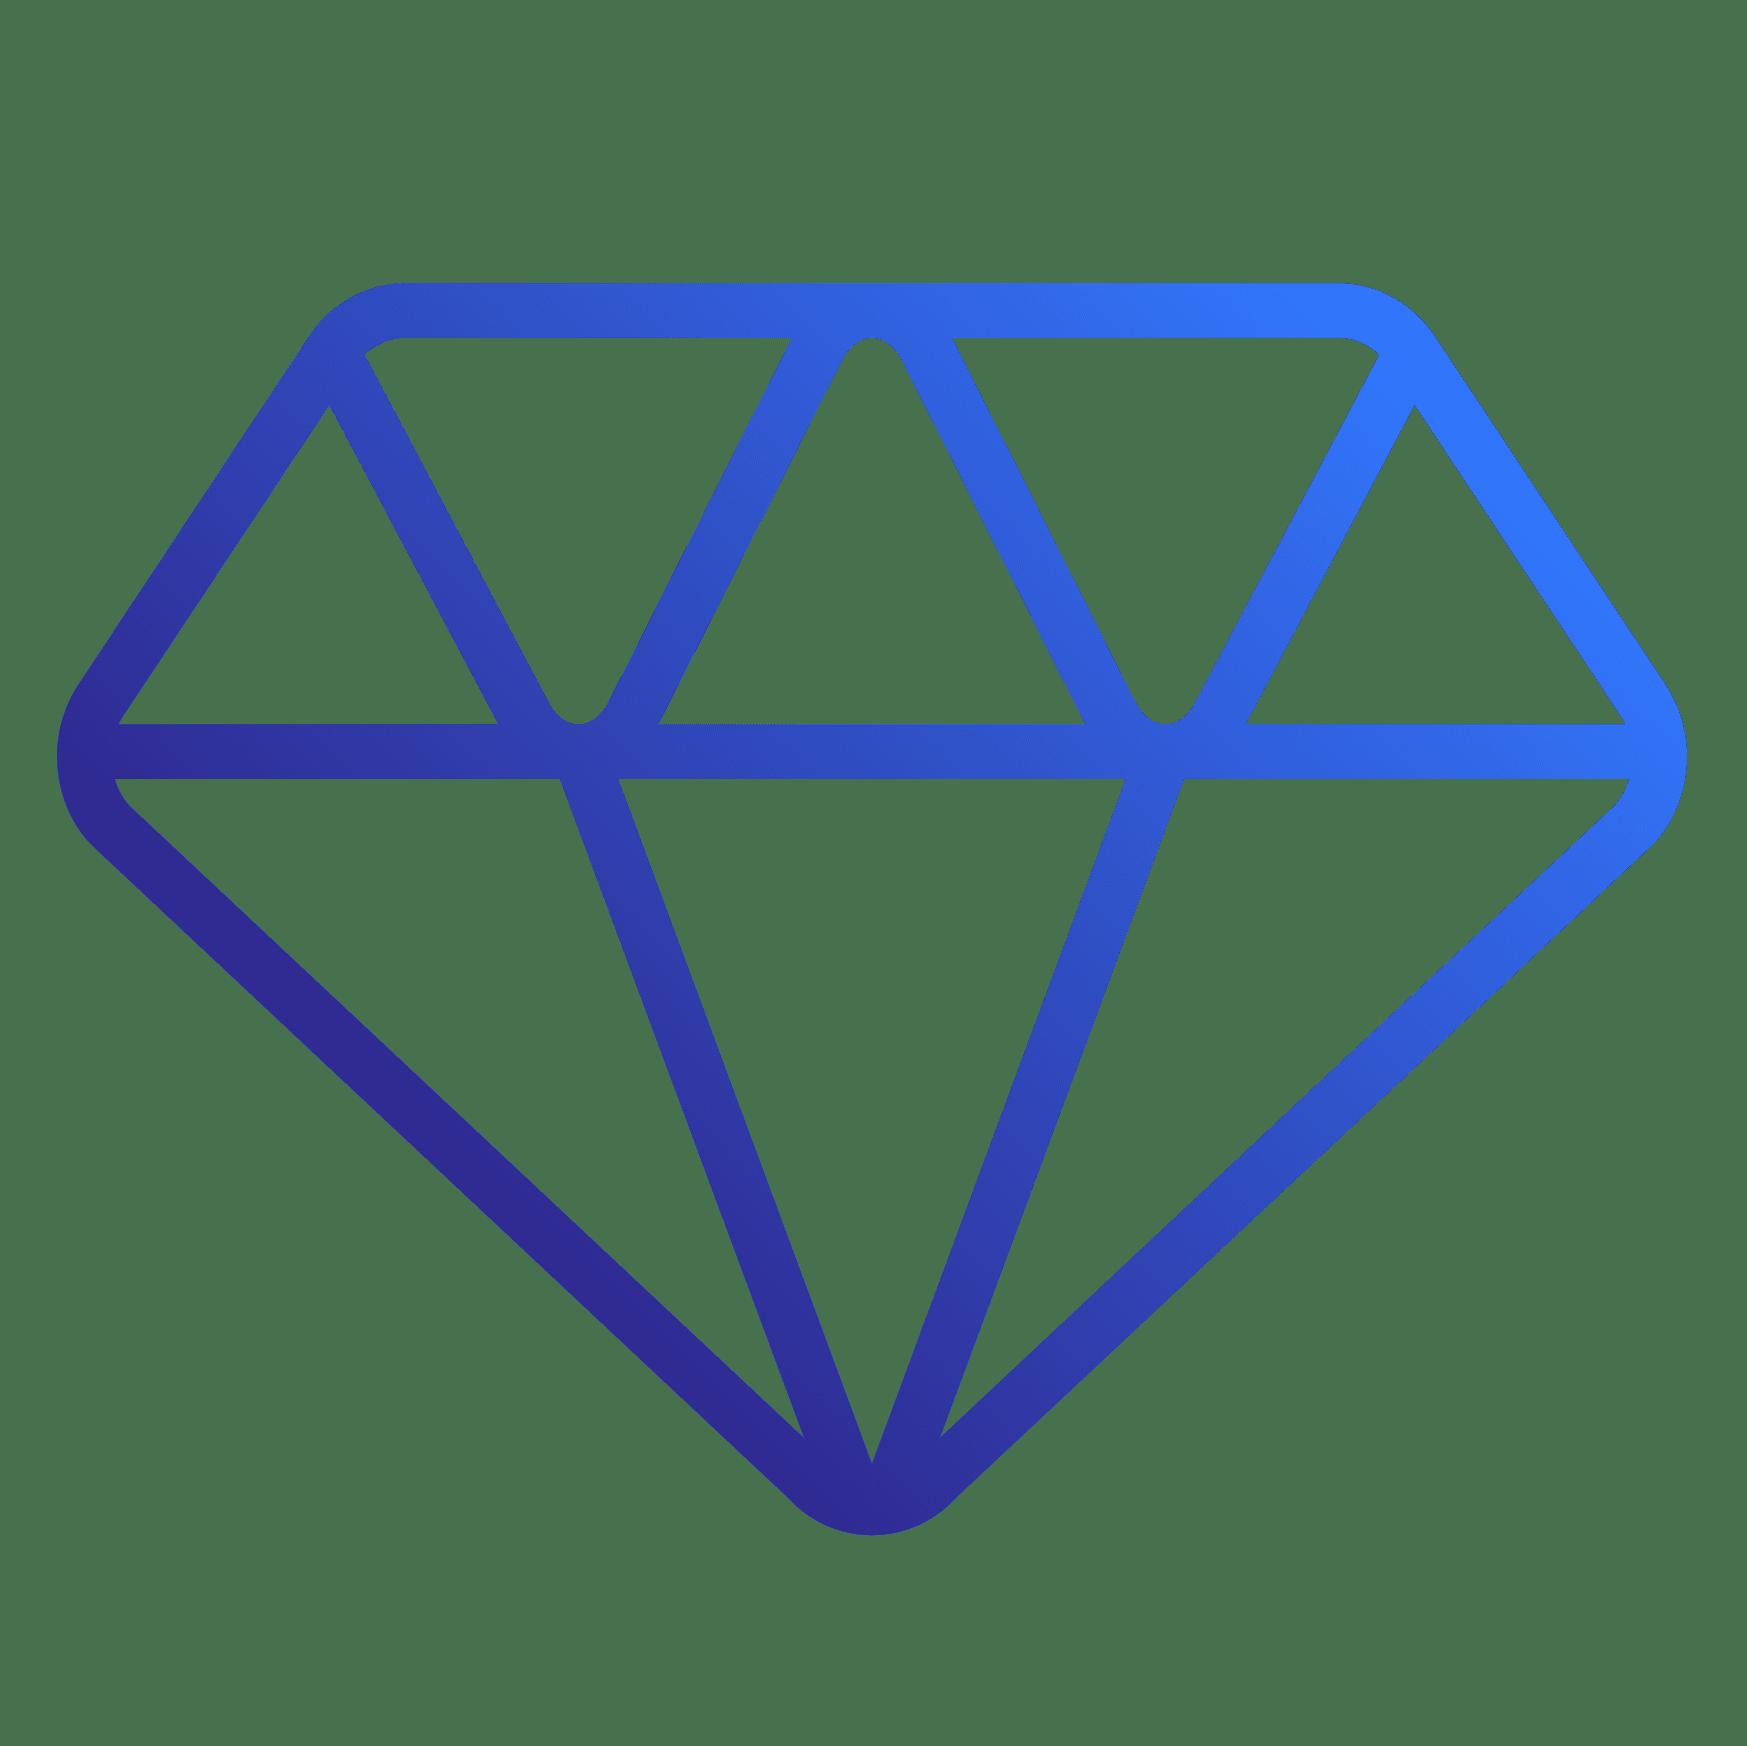 Excellence icon of a diamond,